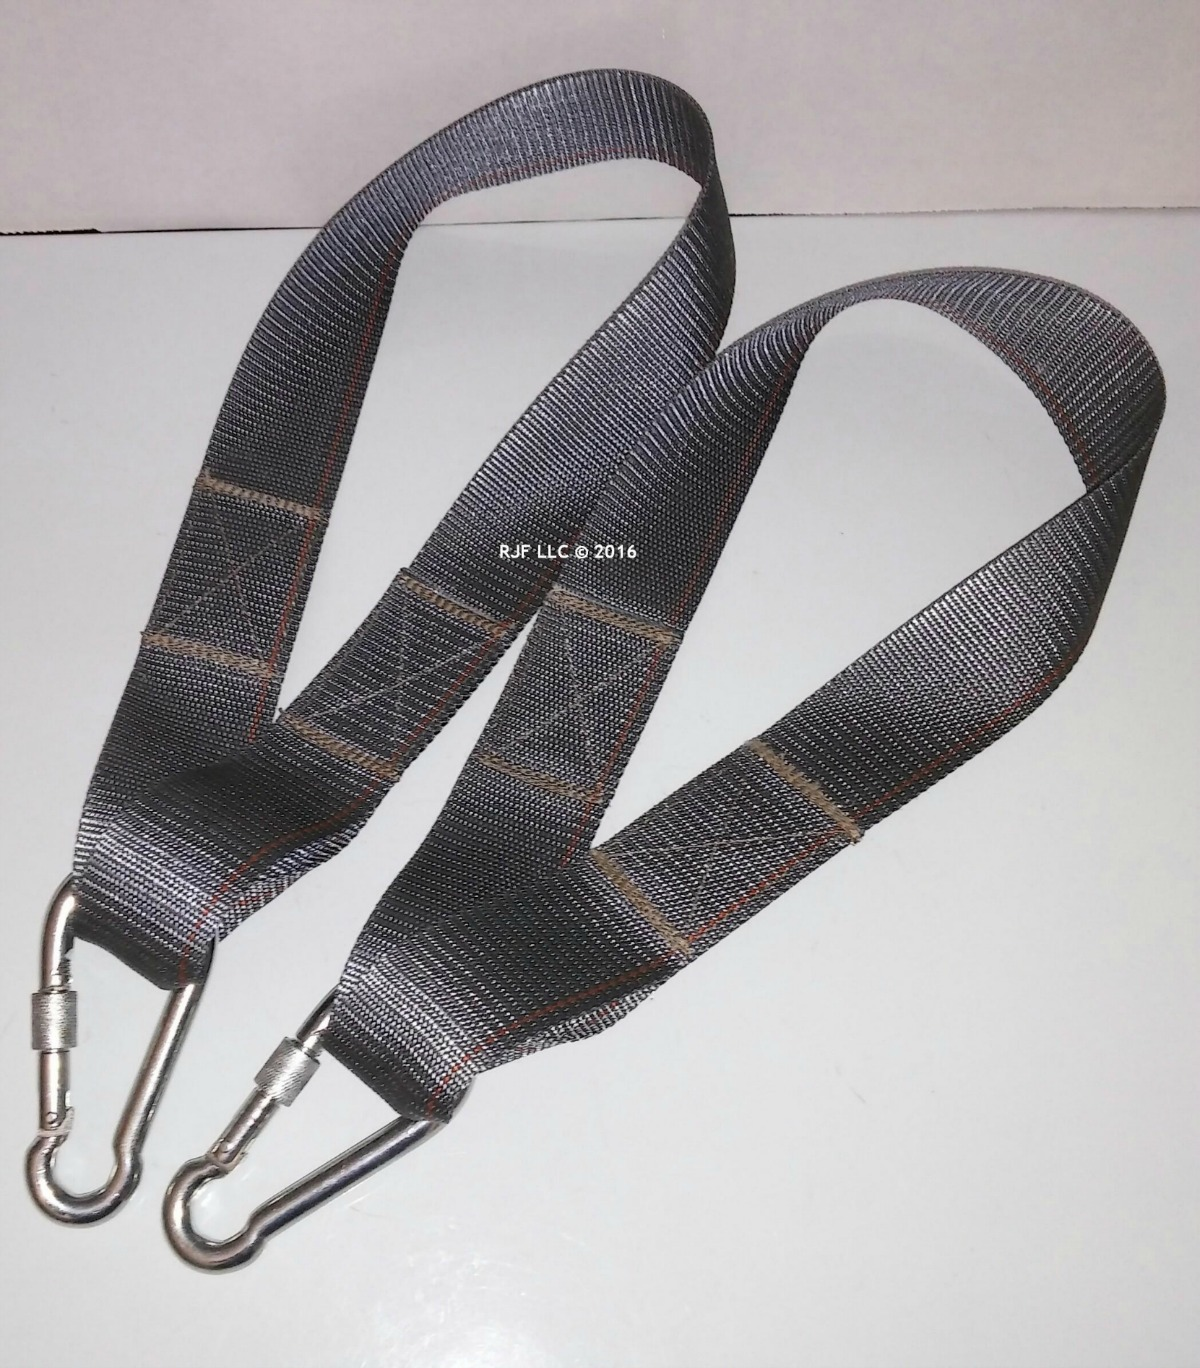 48 Inch Hanging Kits